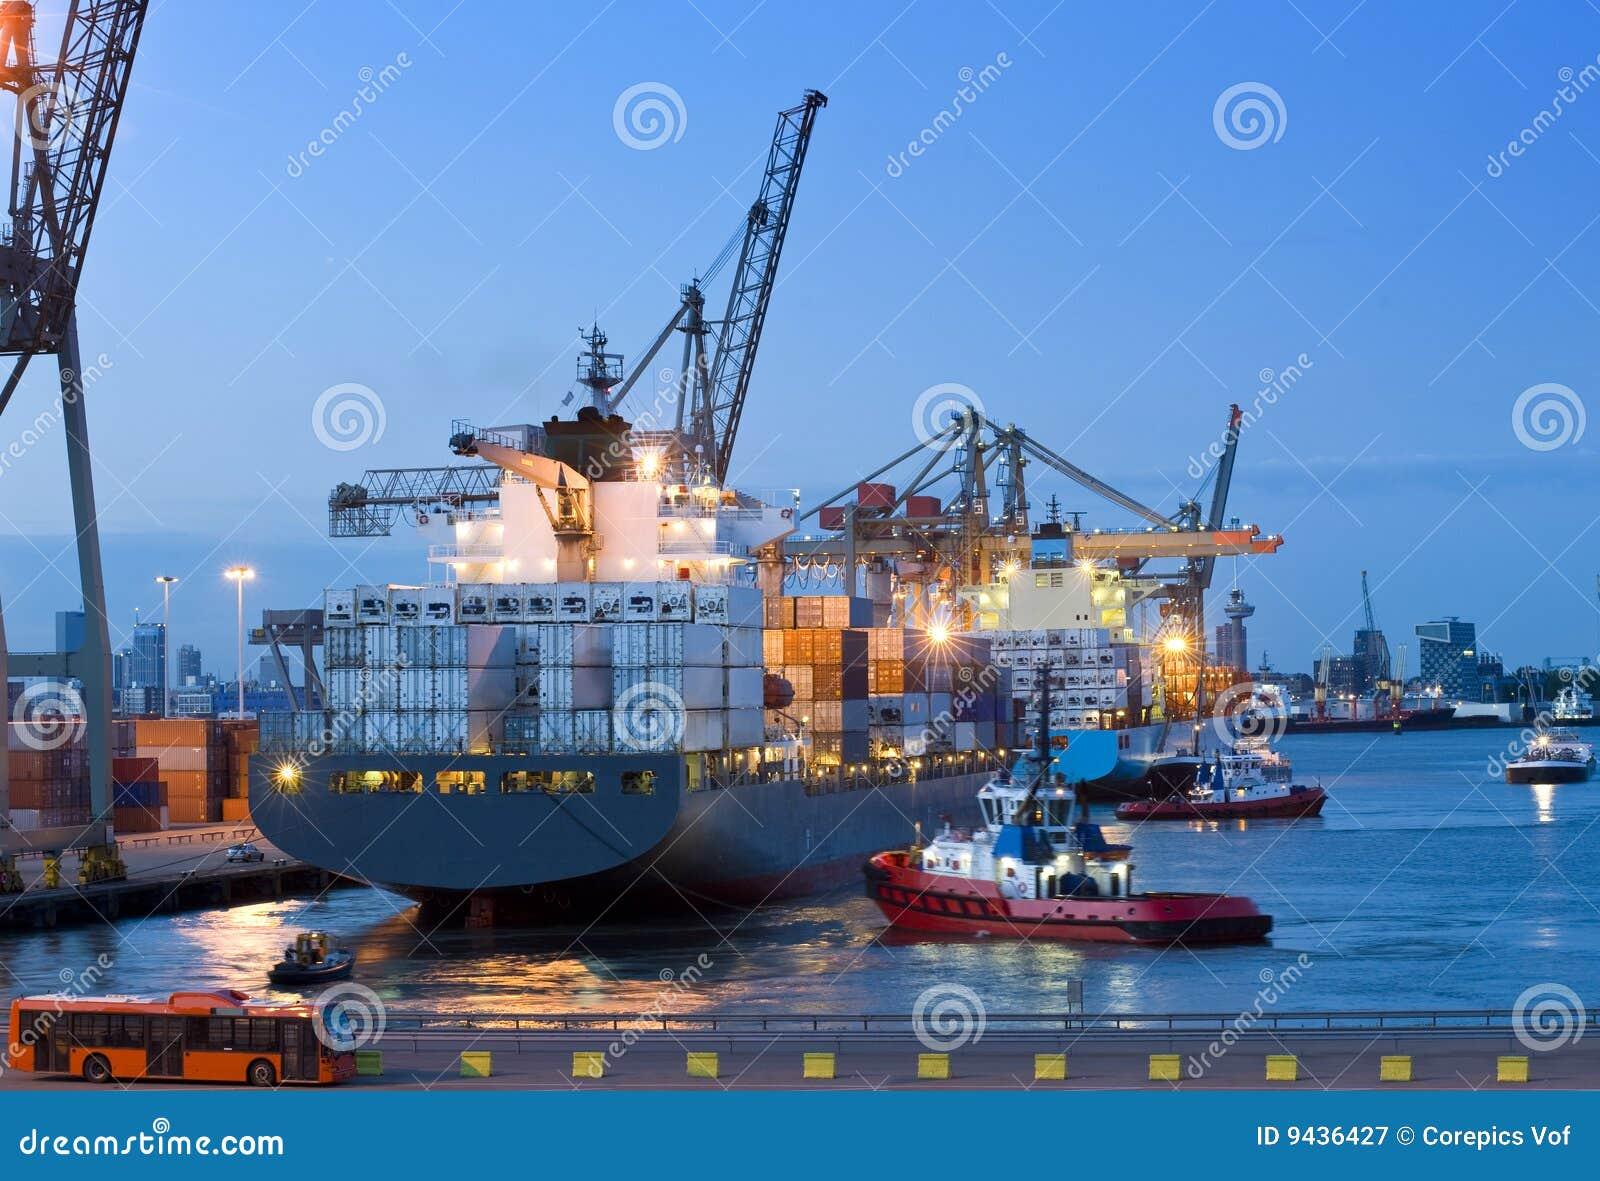 Cargo ship docking